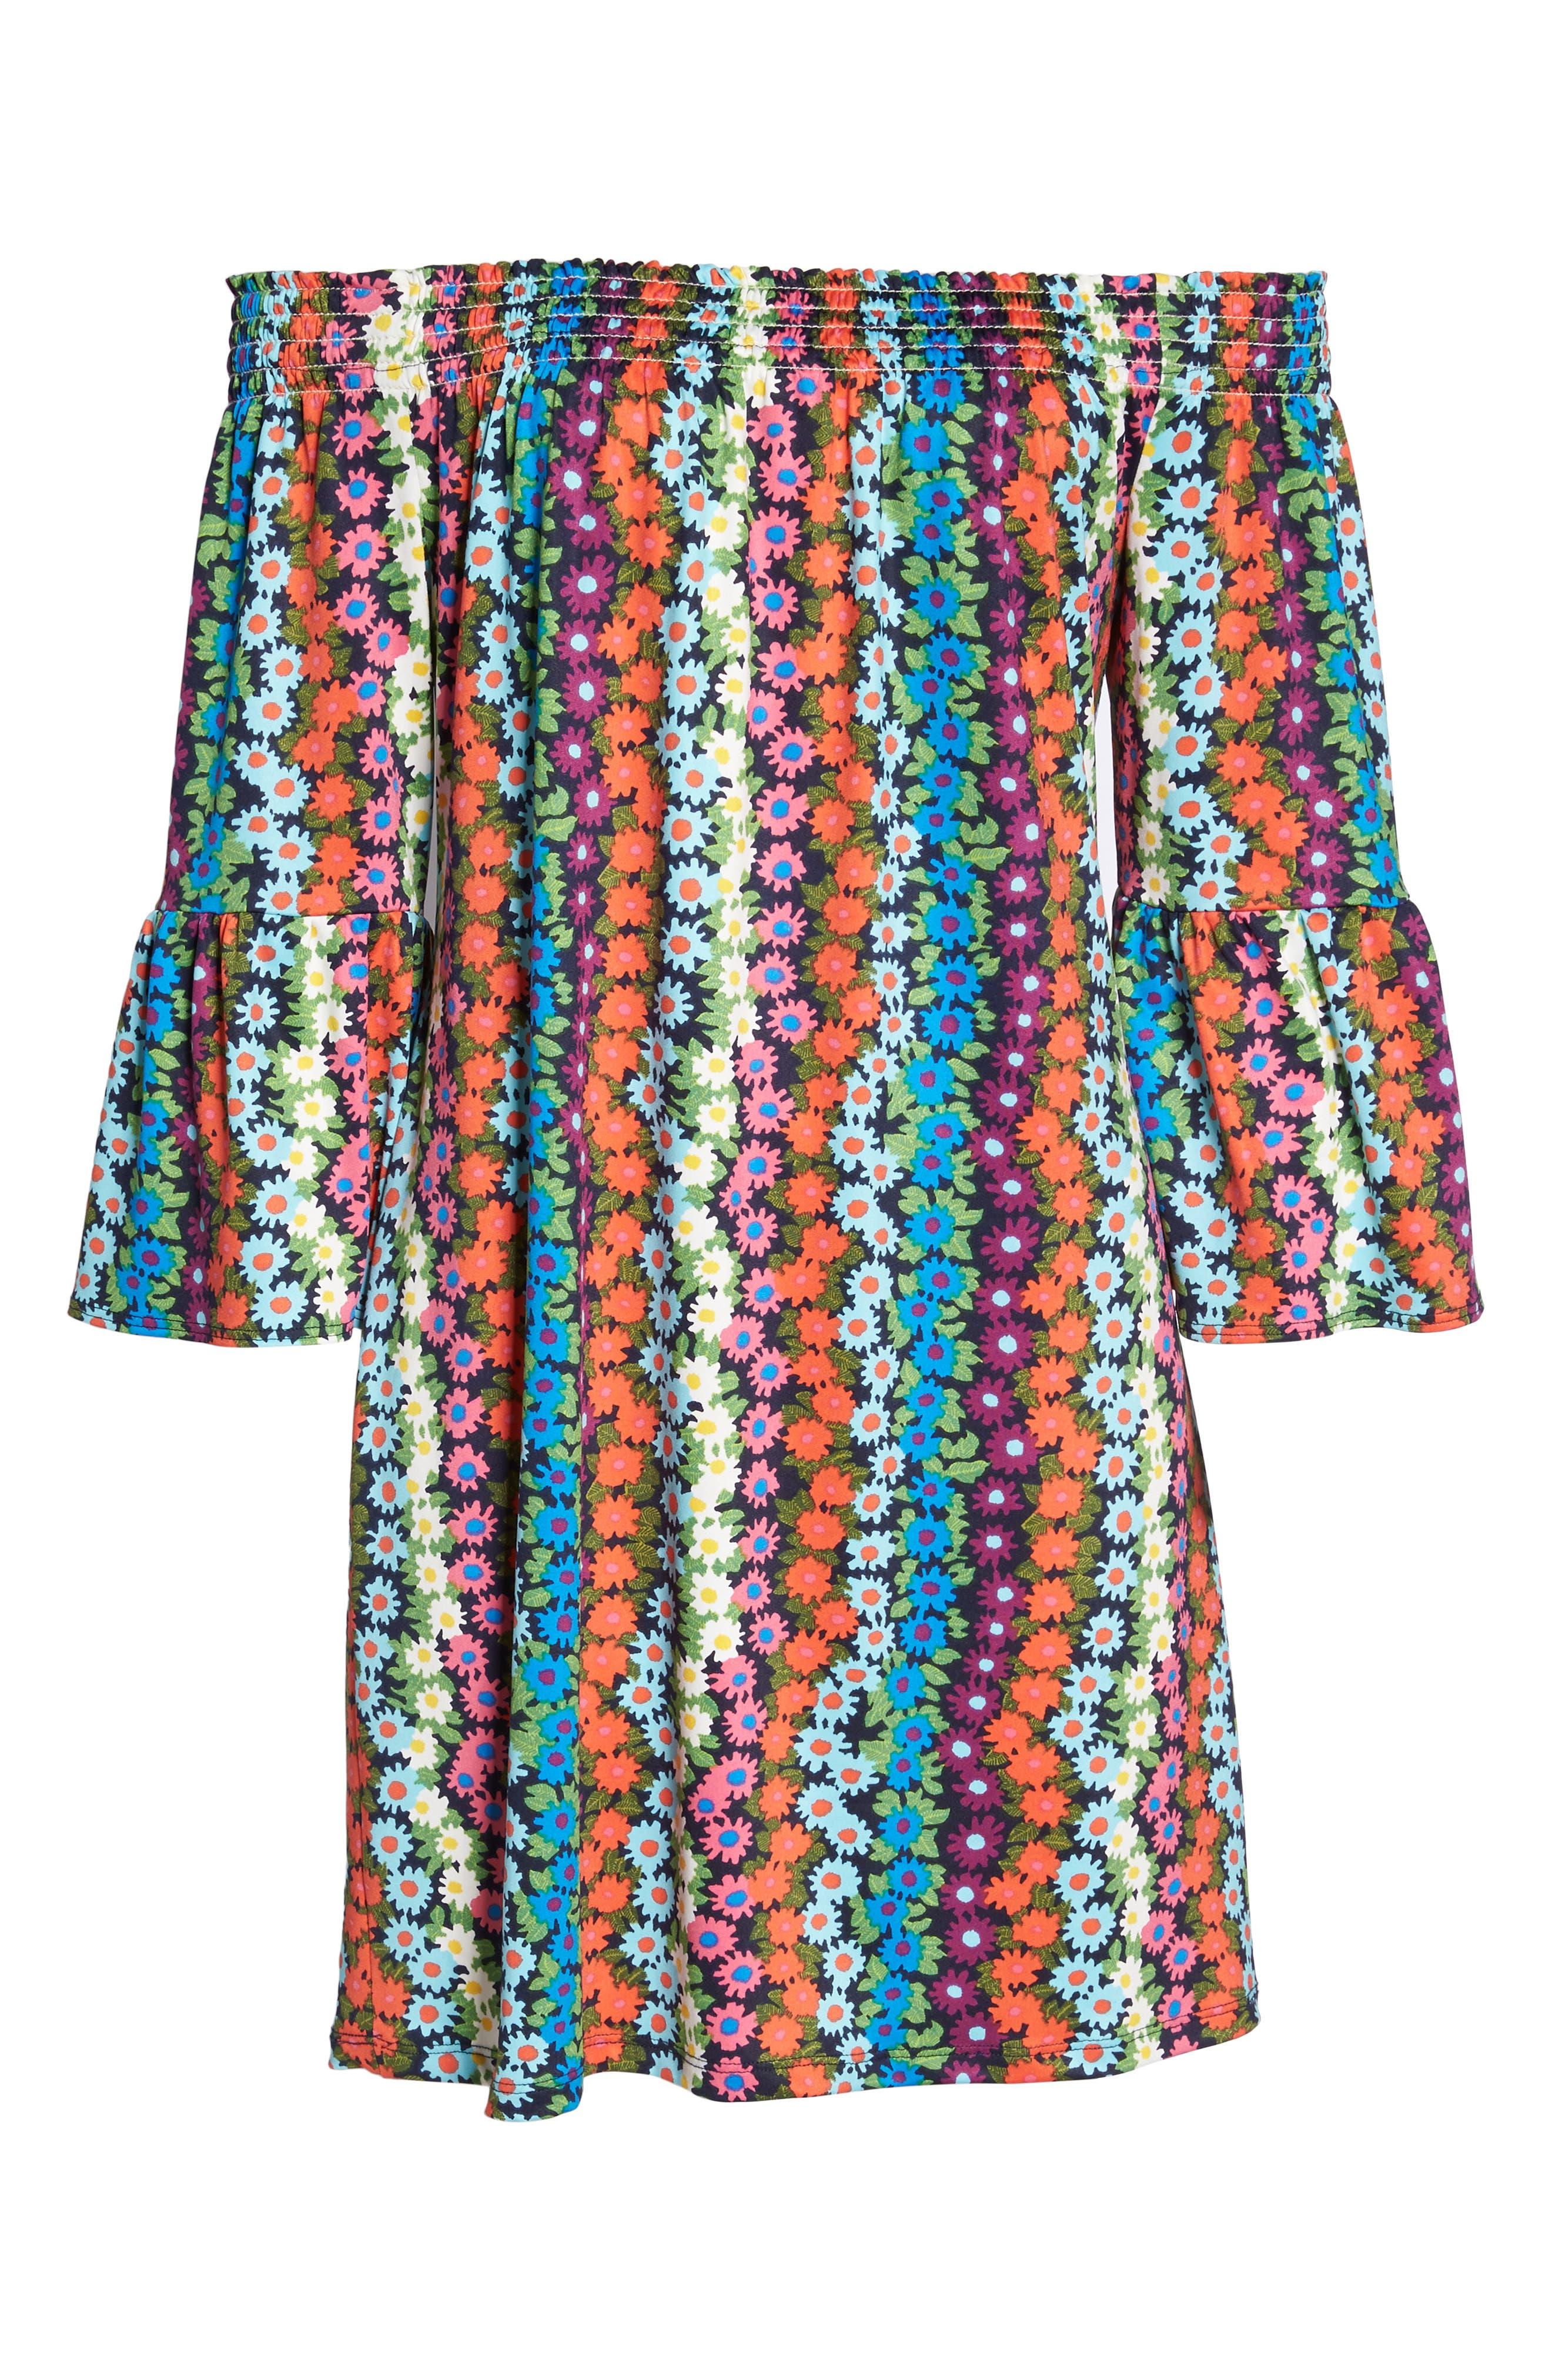 Trina Turk Off the Shoulder Bell Sleeve Dress,                             Alternate thumbnail 6, color,                             Multi